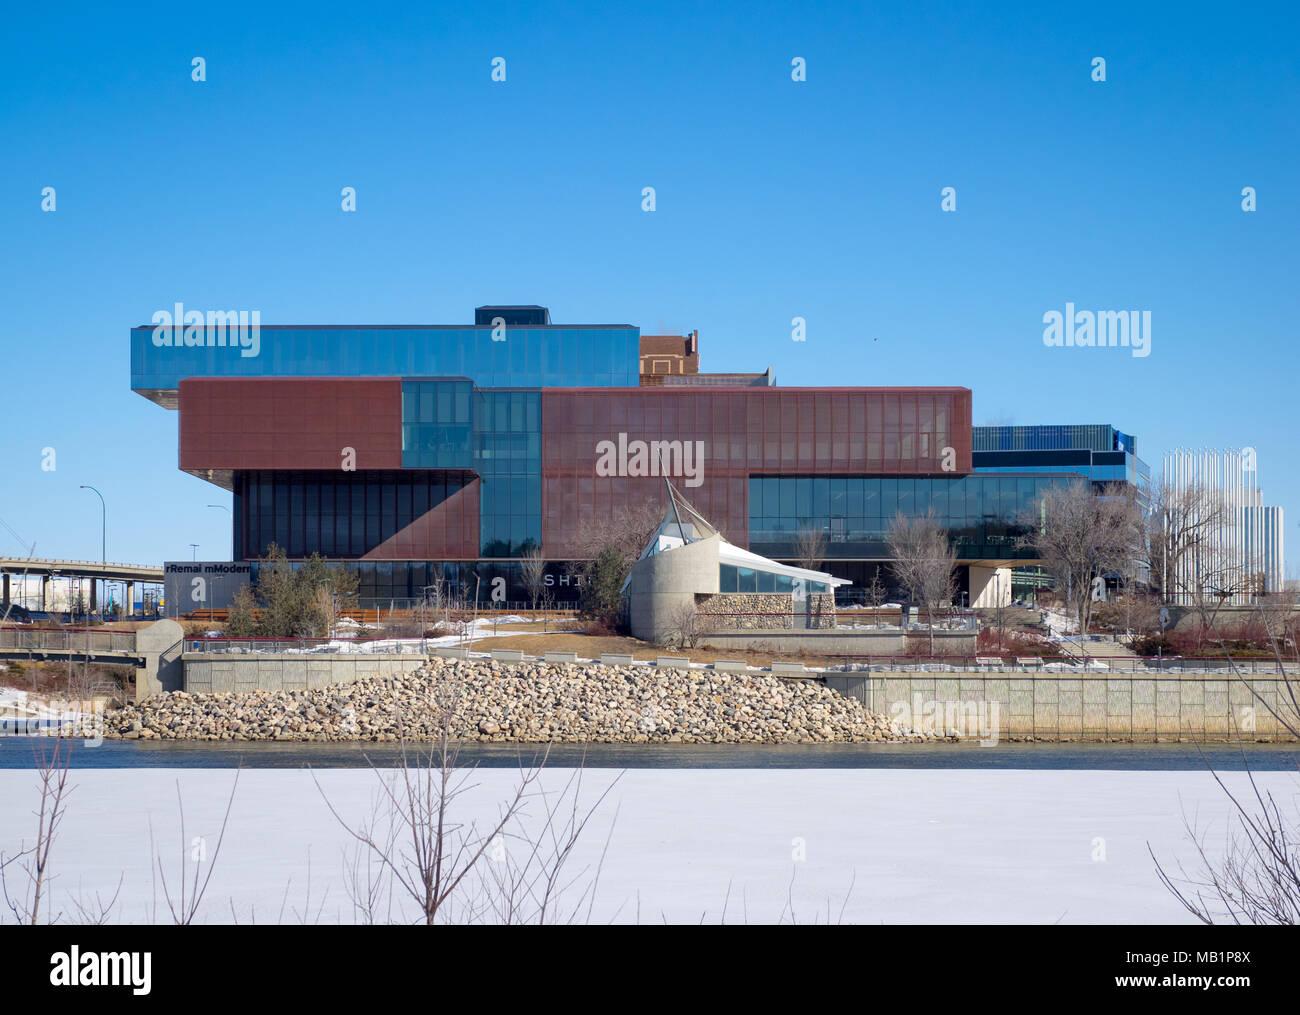 The exterior of the Remai Modern Art Gallery as seen from across the frozen South Saskatchewan River in Saskatoon, Saskatchewan, Canada. - Stock Image